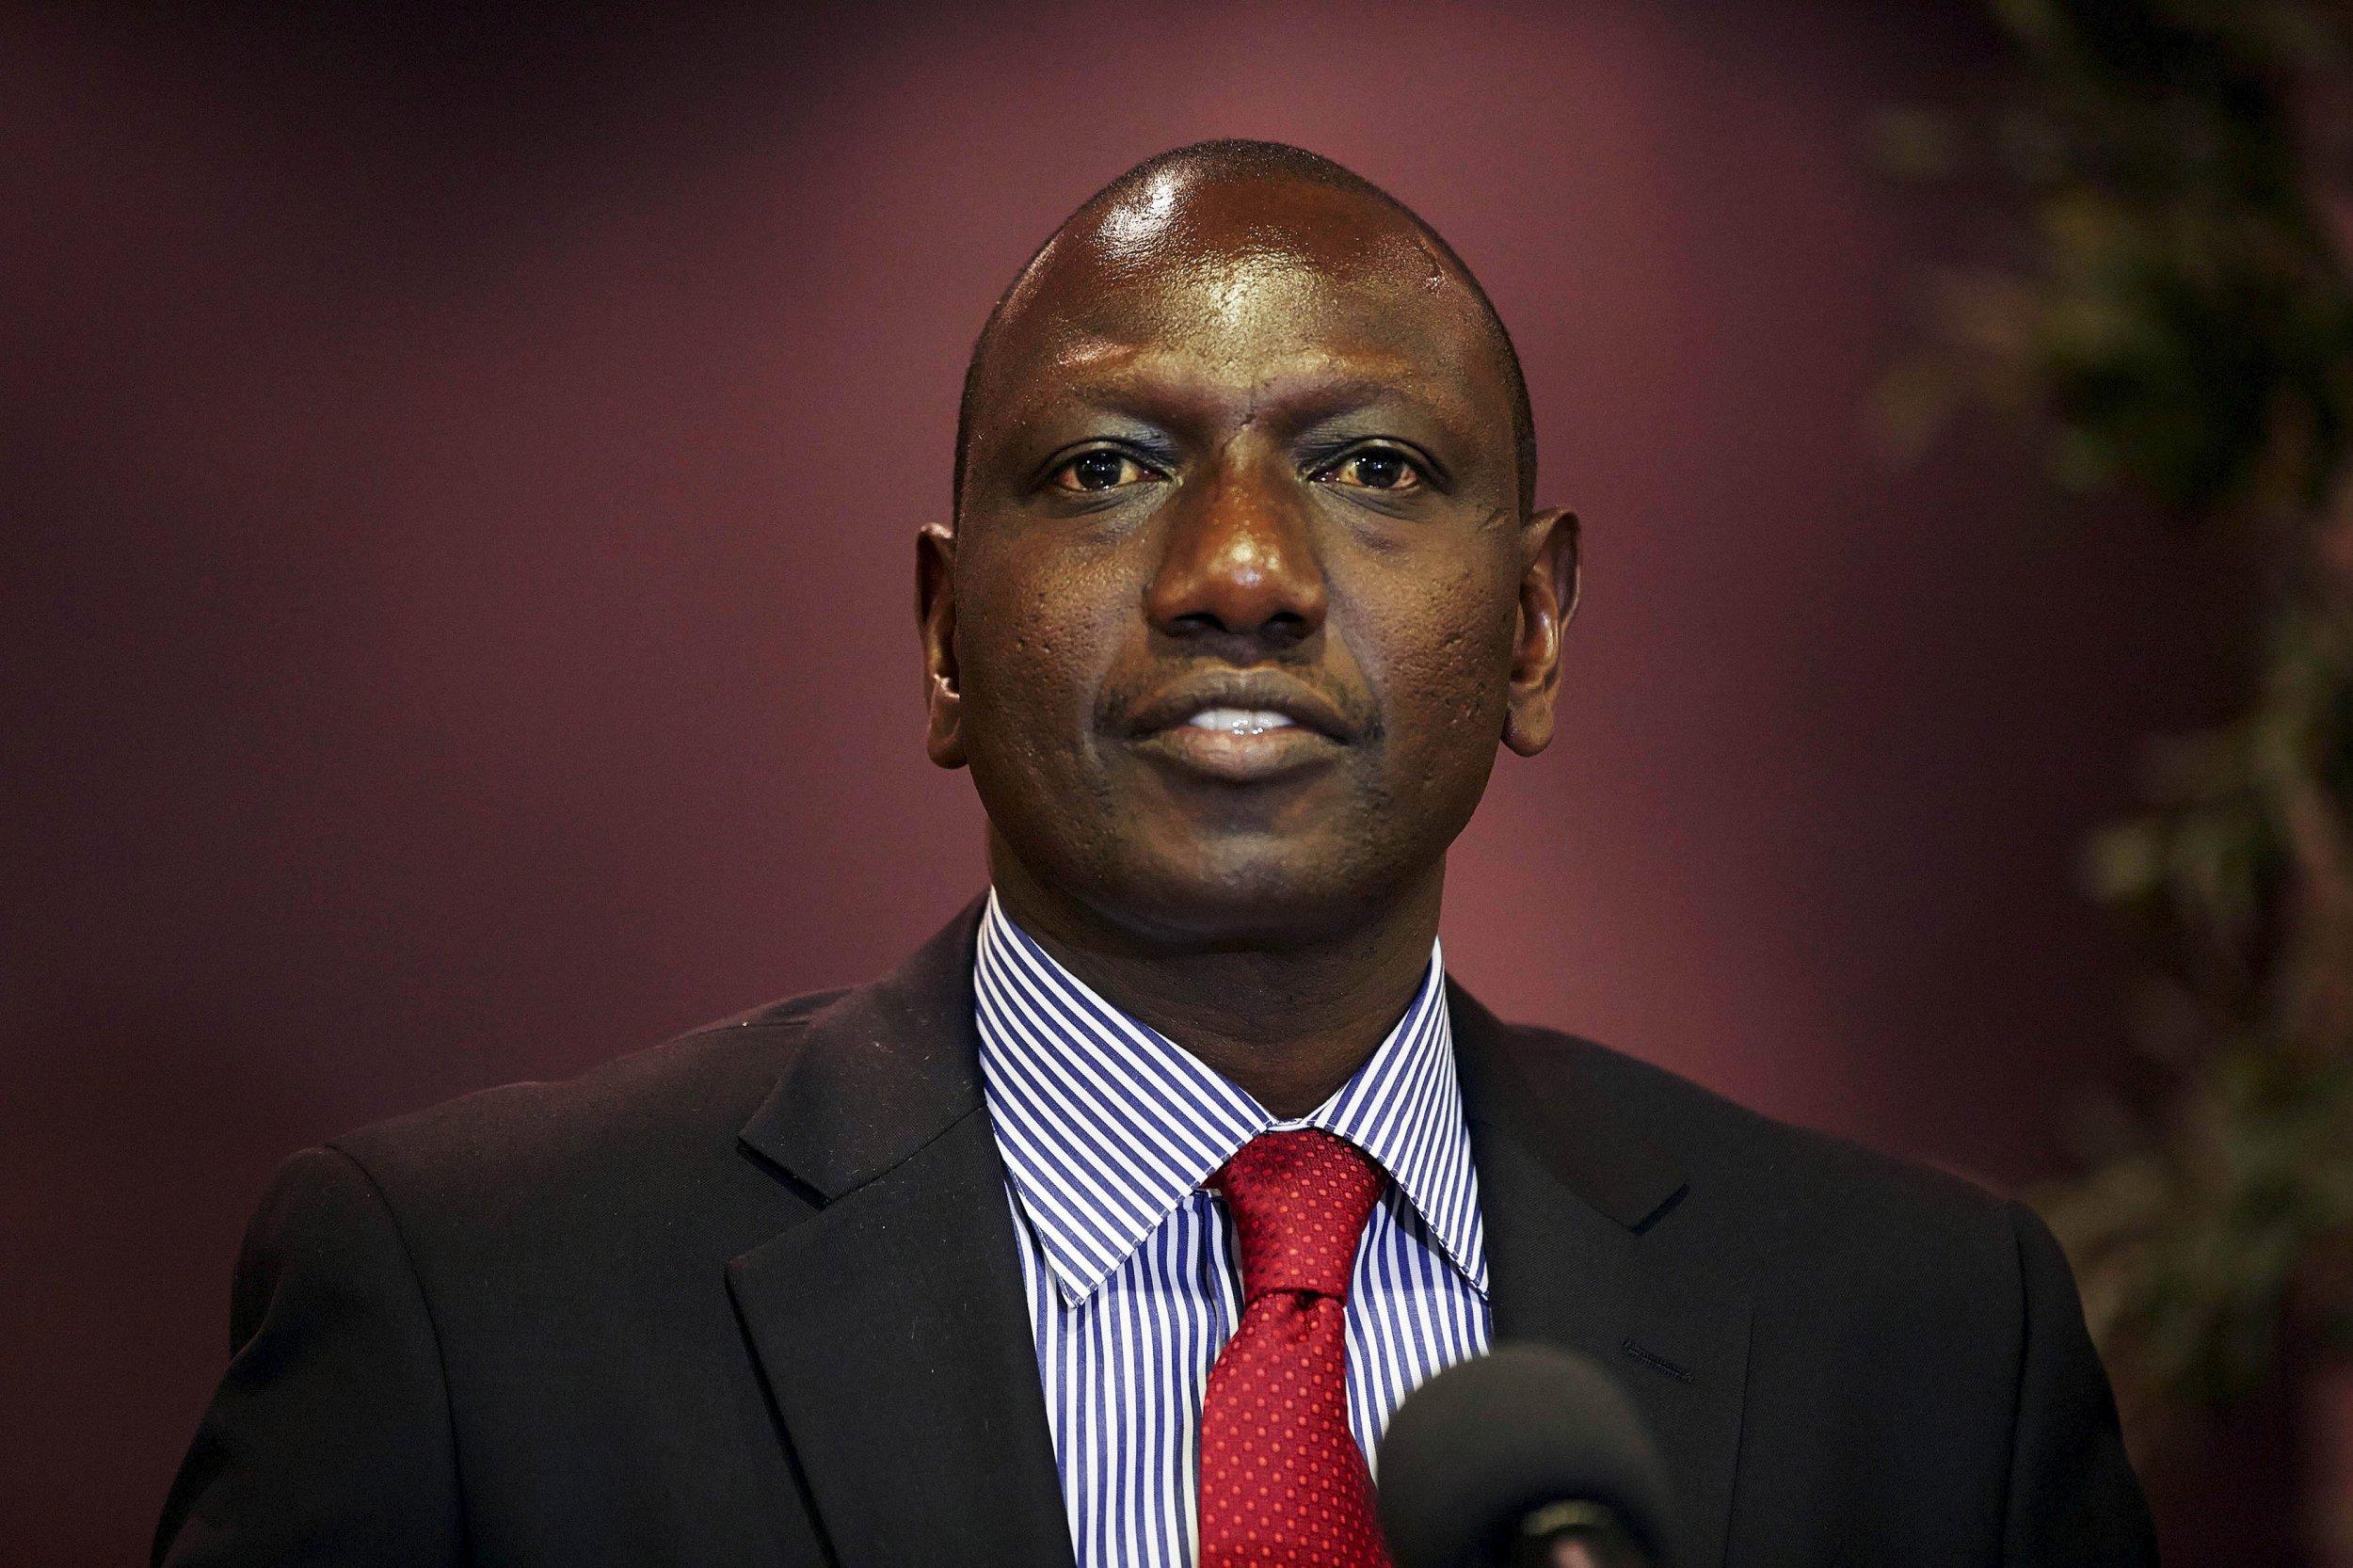 Kenya's Deputy President William Ruto speaks at the Hague.